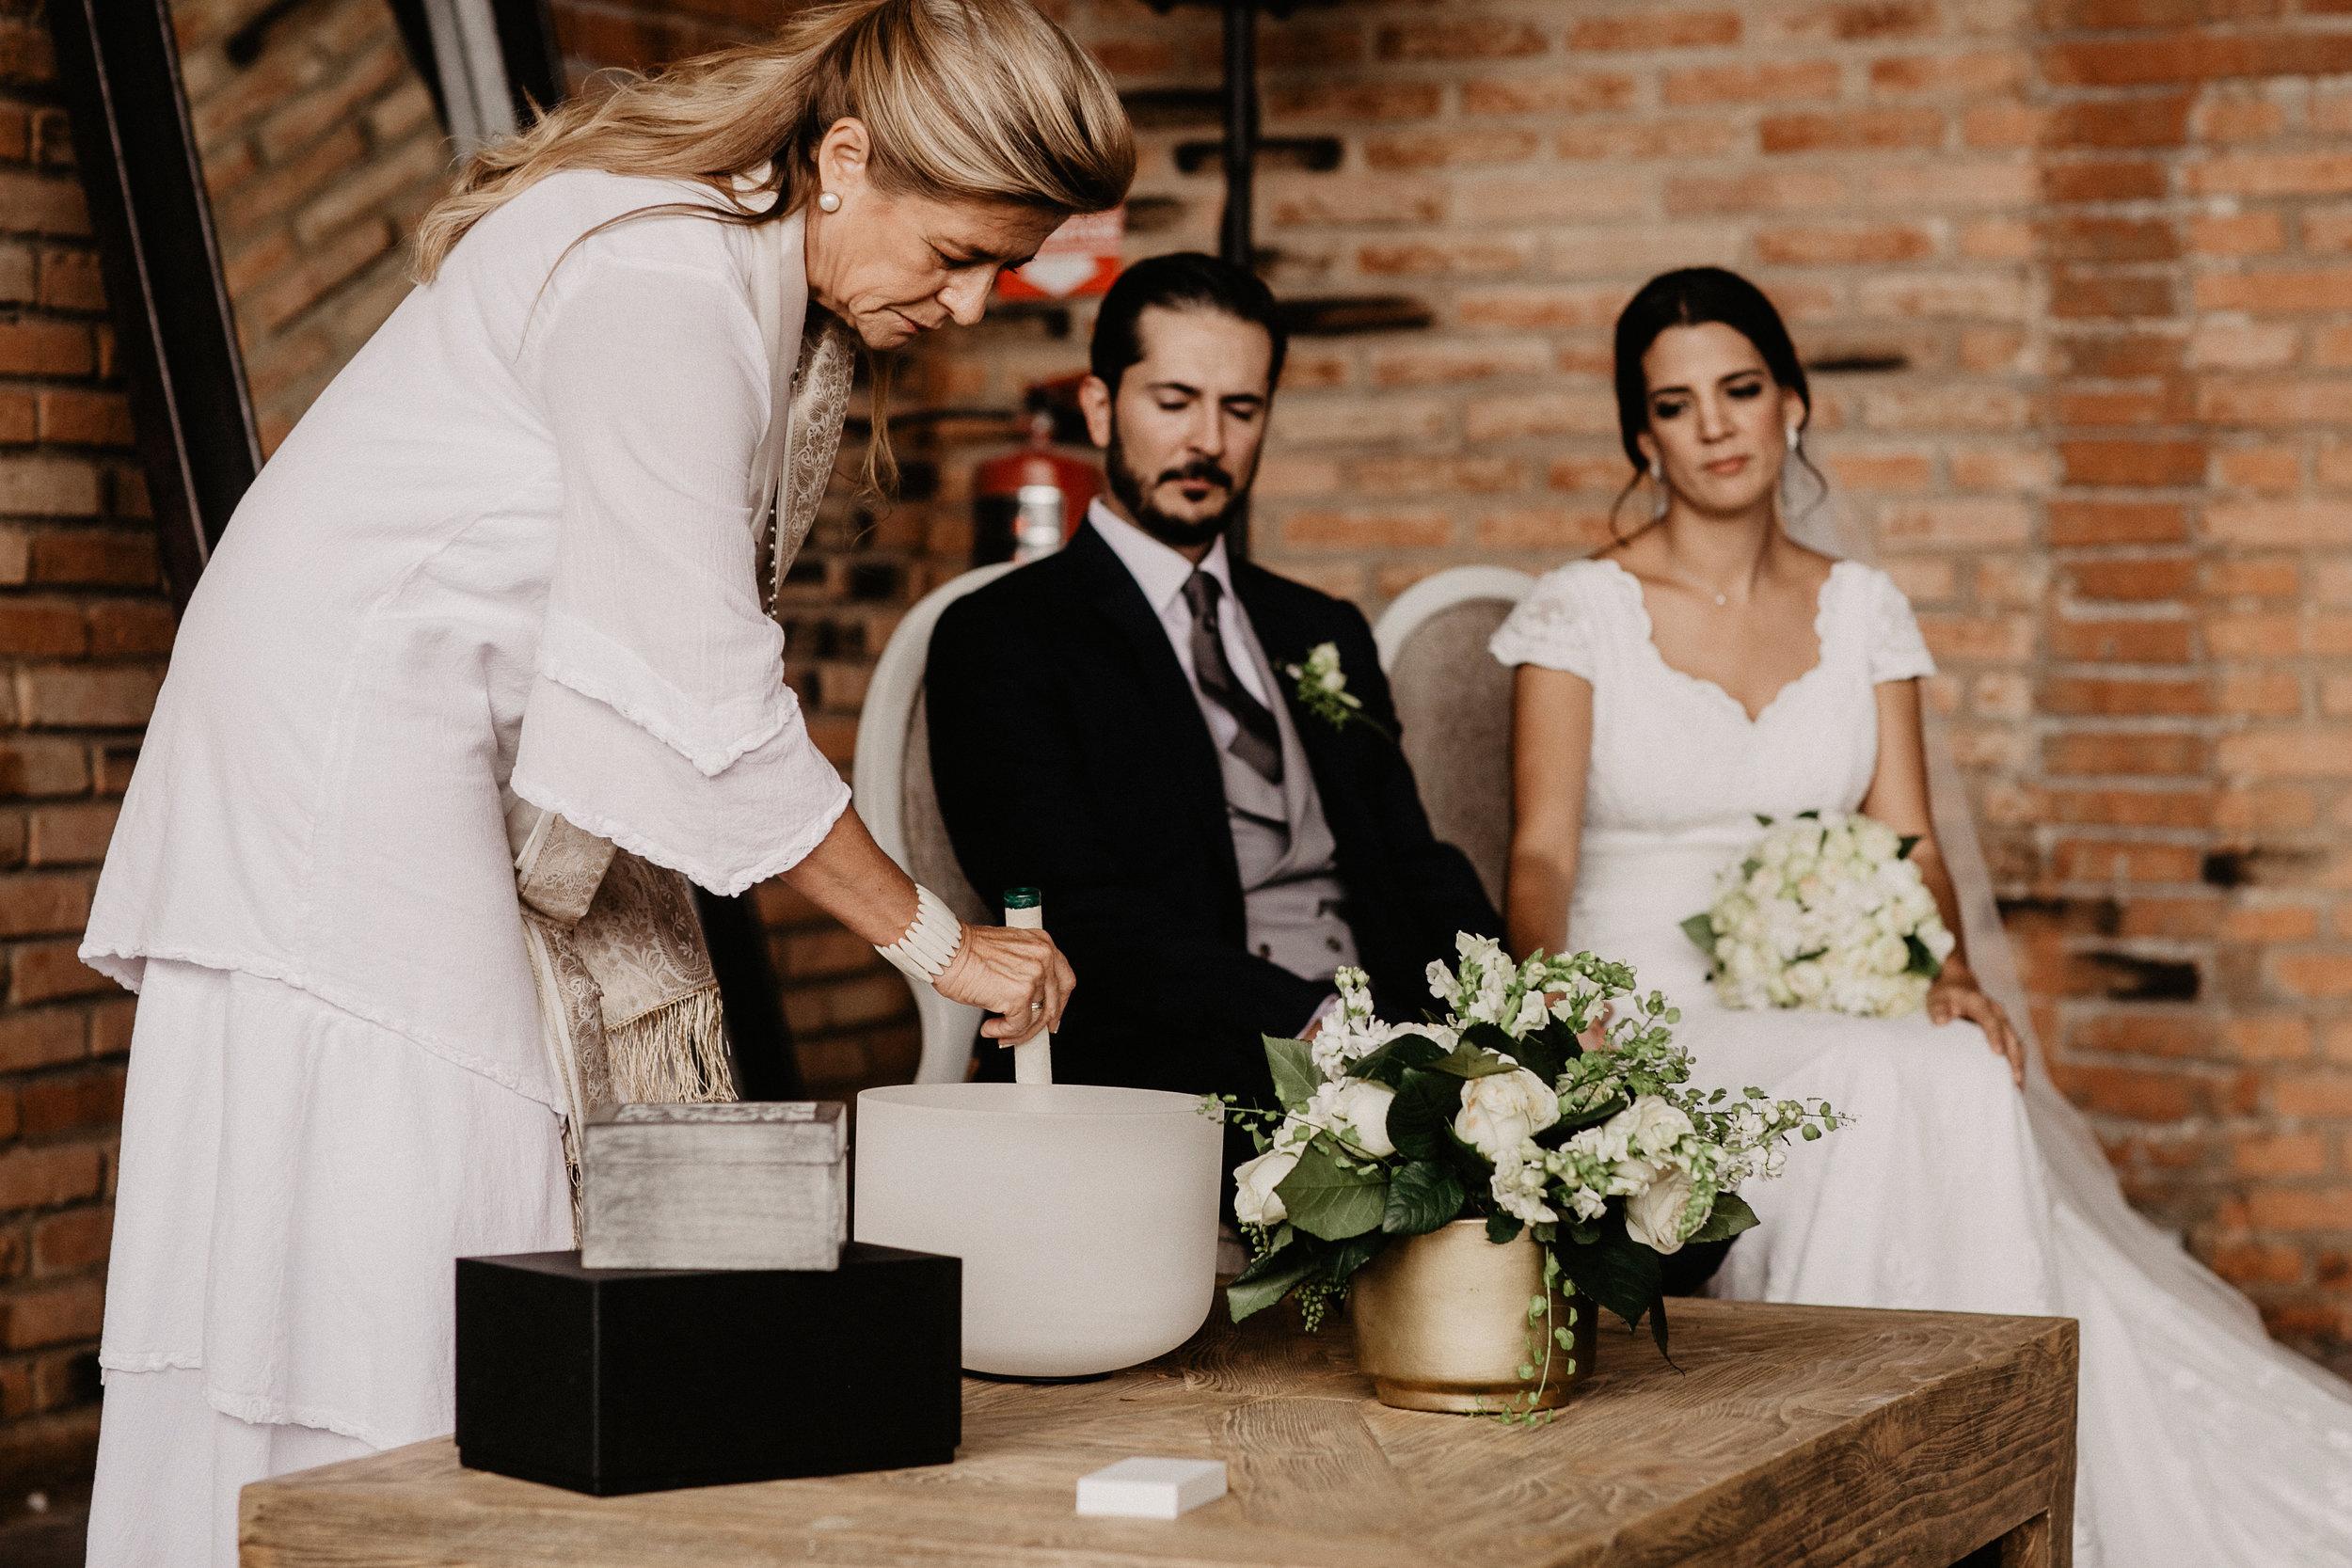 alfonso_flores_destination_wedding_photographer_pau_alonso_376.JPG